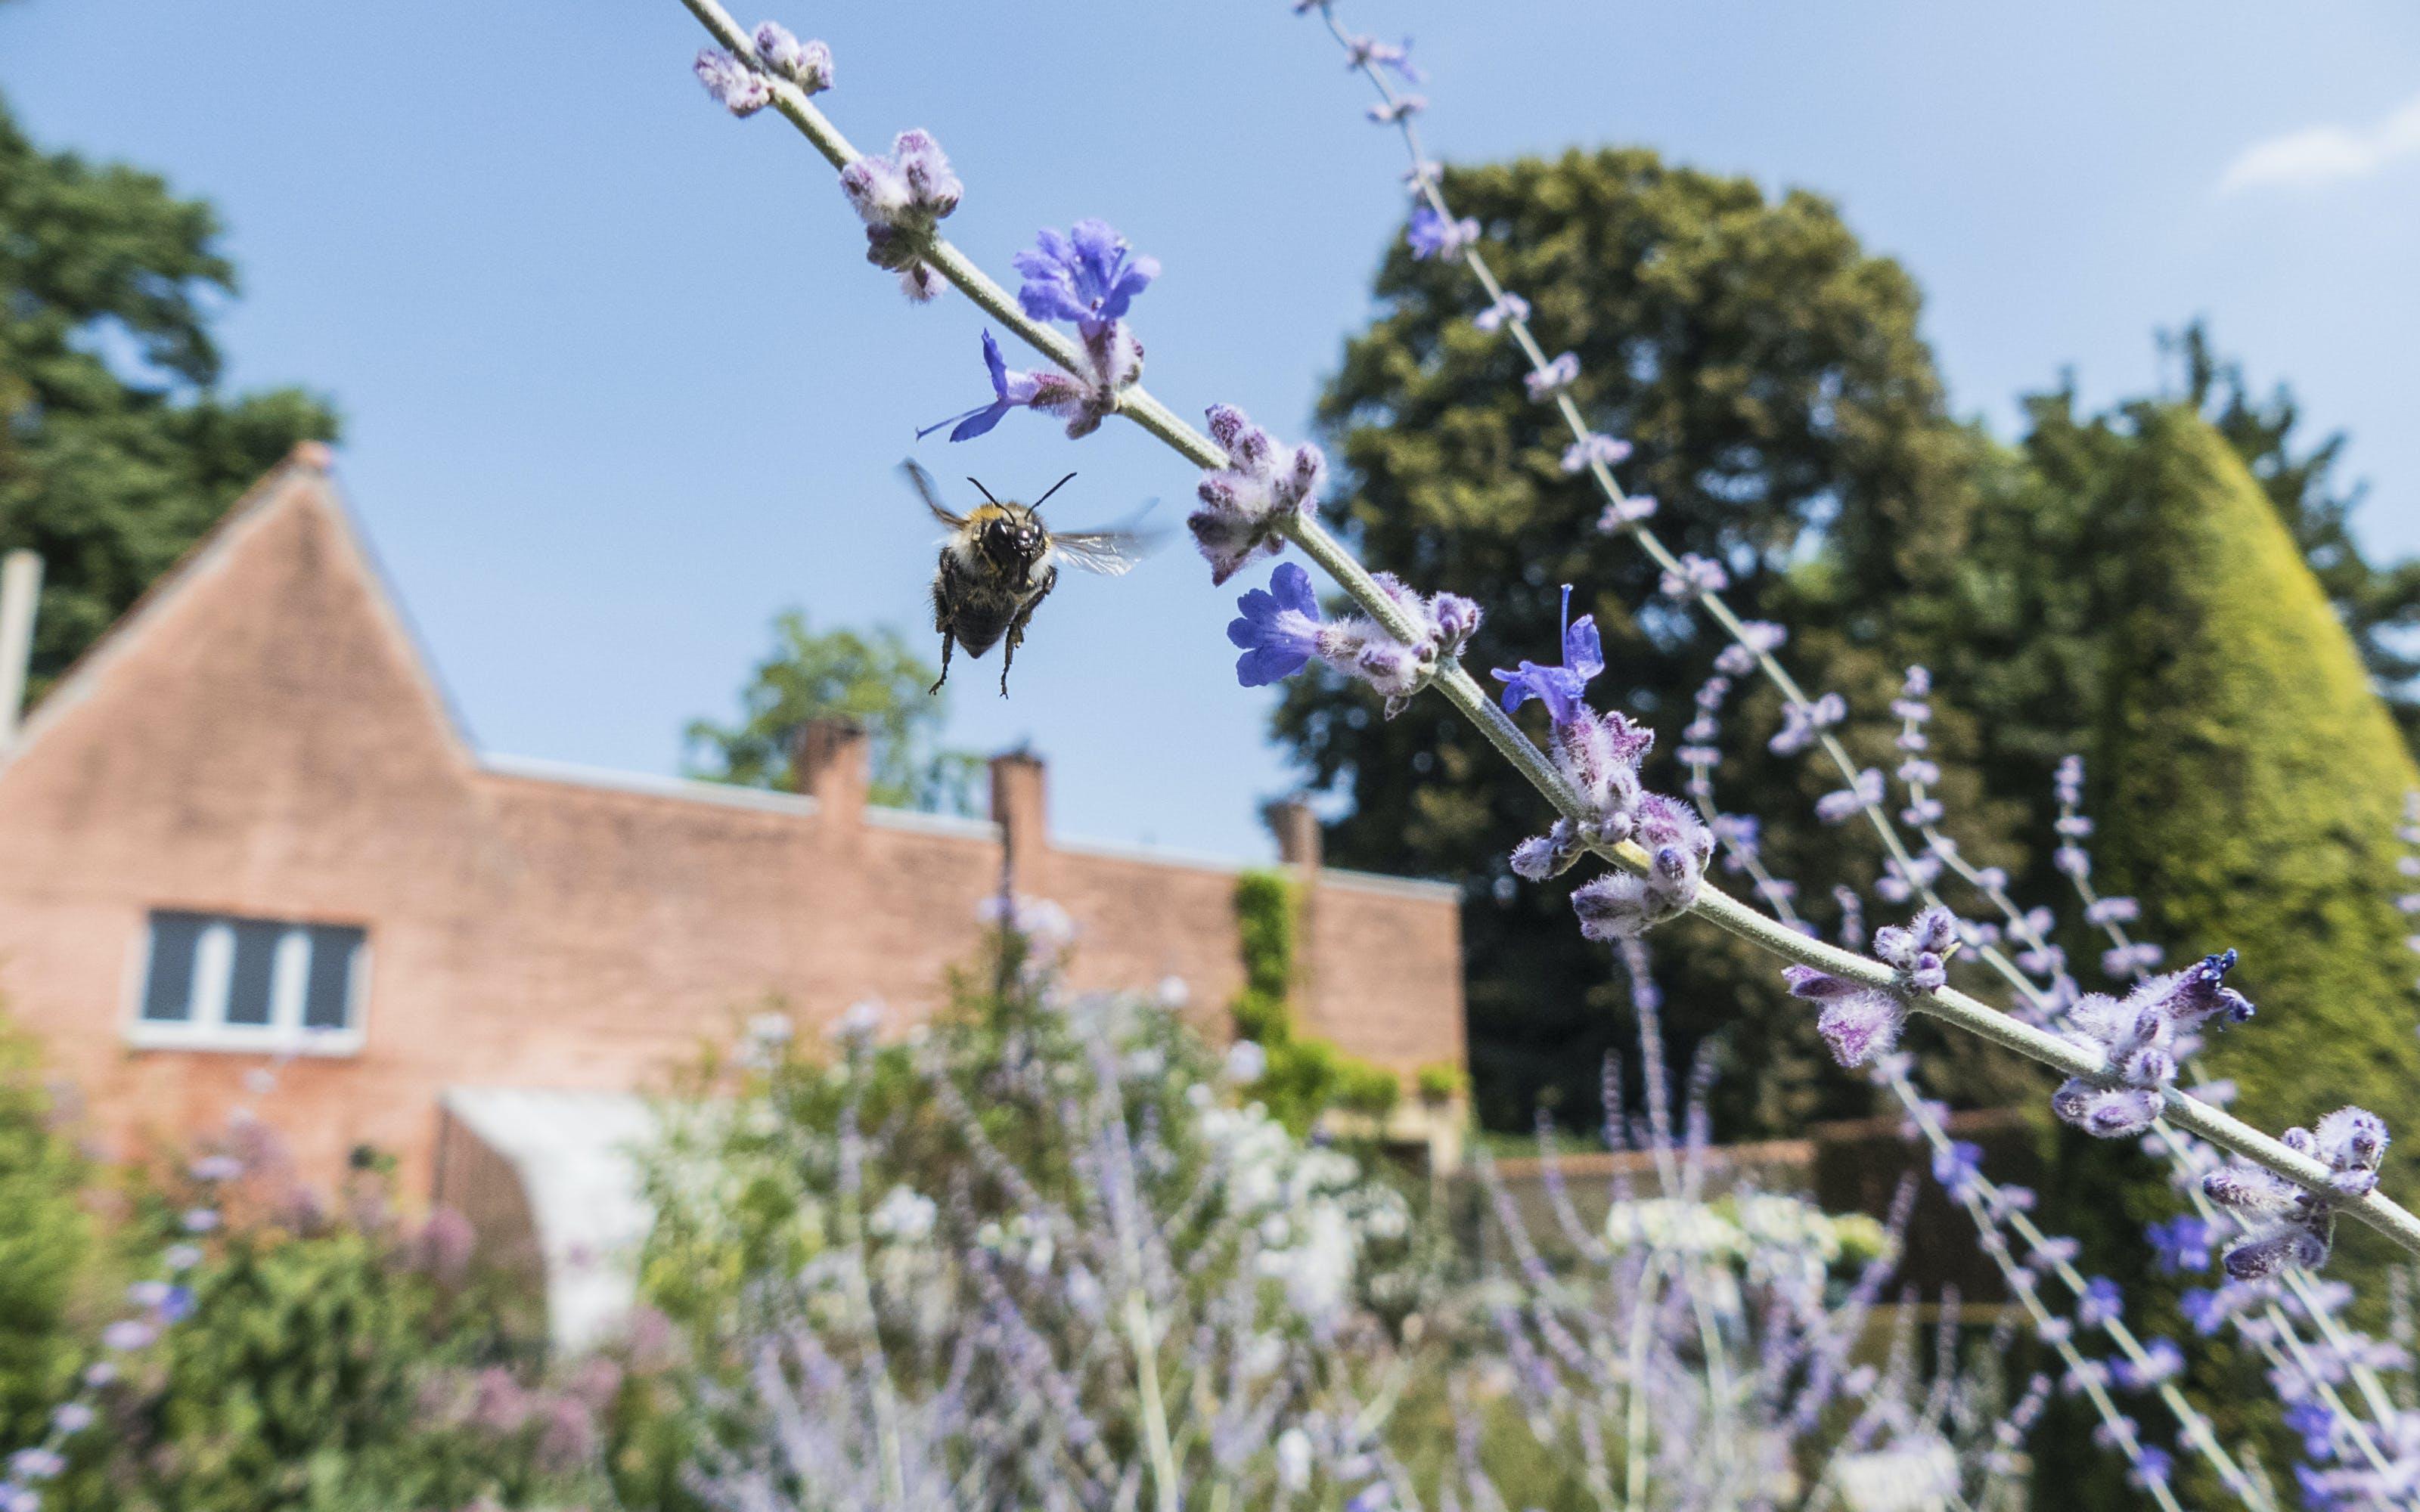 Kostenloses Stock Foto zu blauer himmel, fliegen, hummel, lila blüten